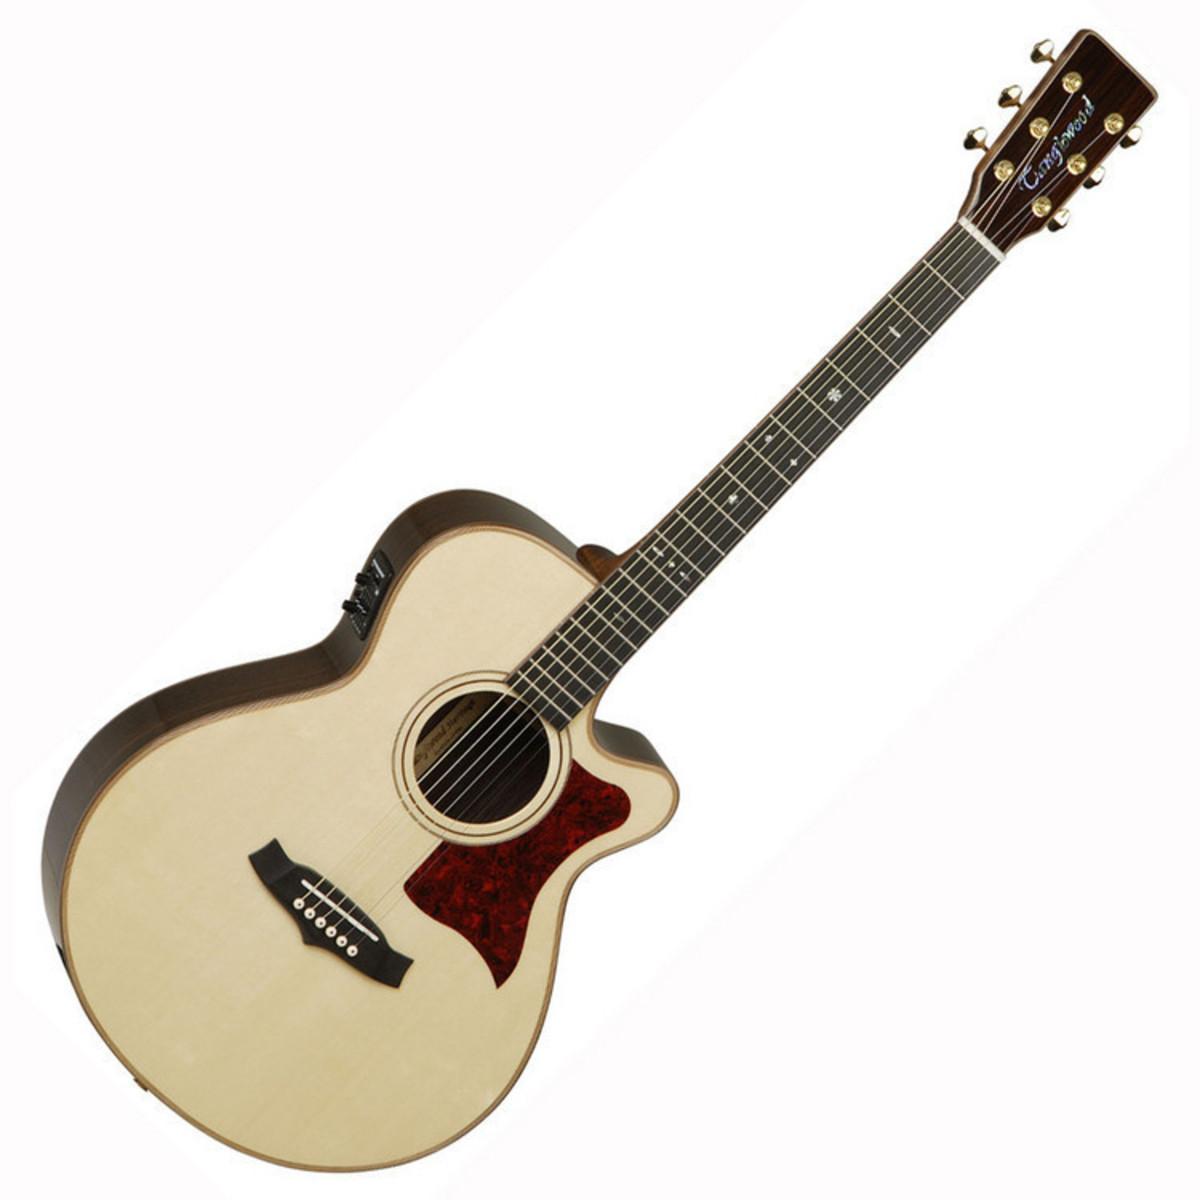 puis tanglewood tw45 patrimoine elec folk guitare. Black Bedroom Furniture Sets. Home Design Ideas